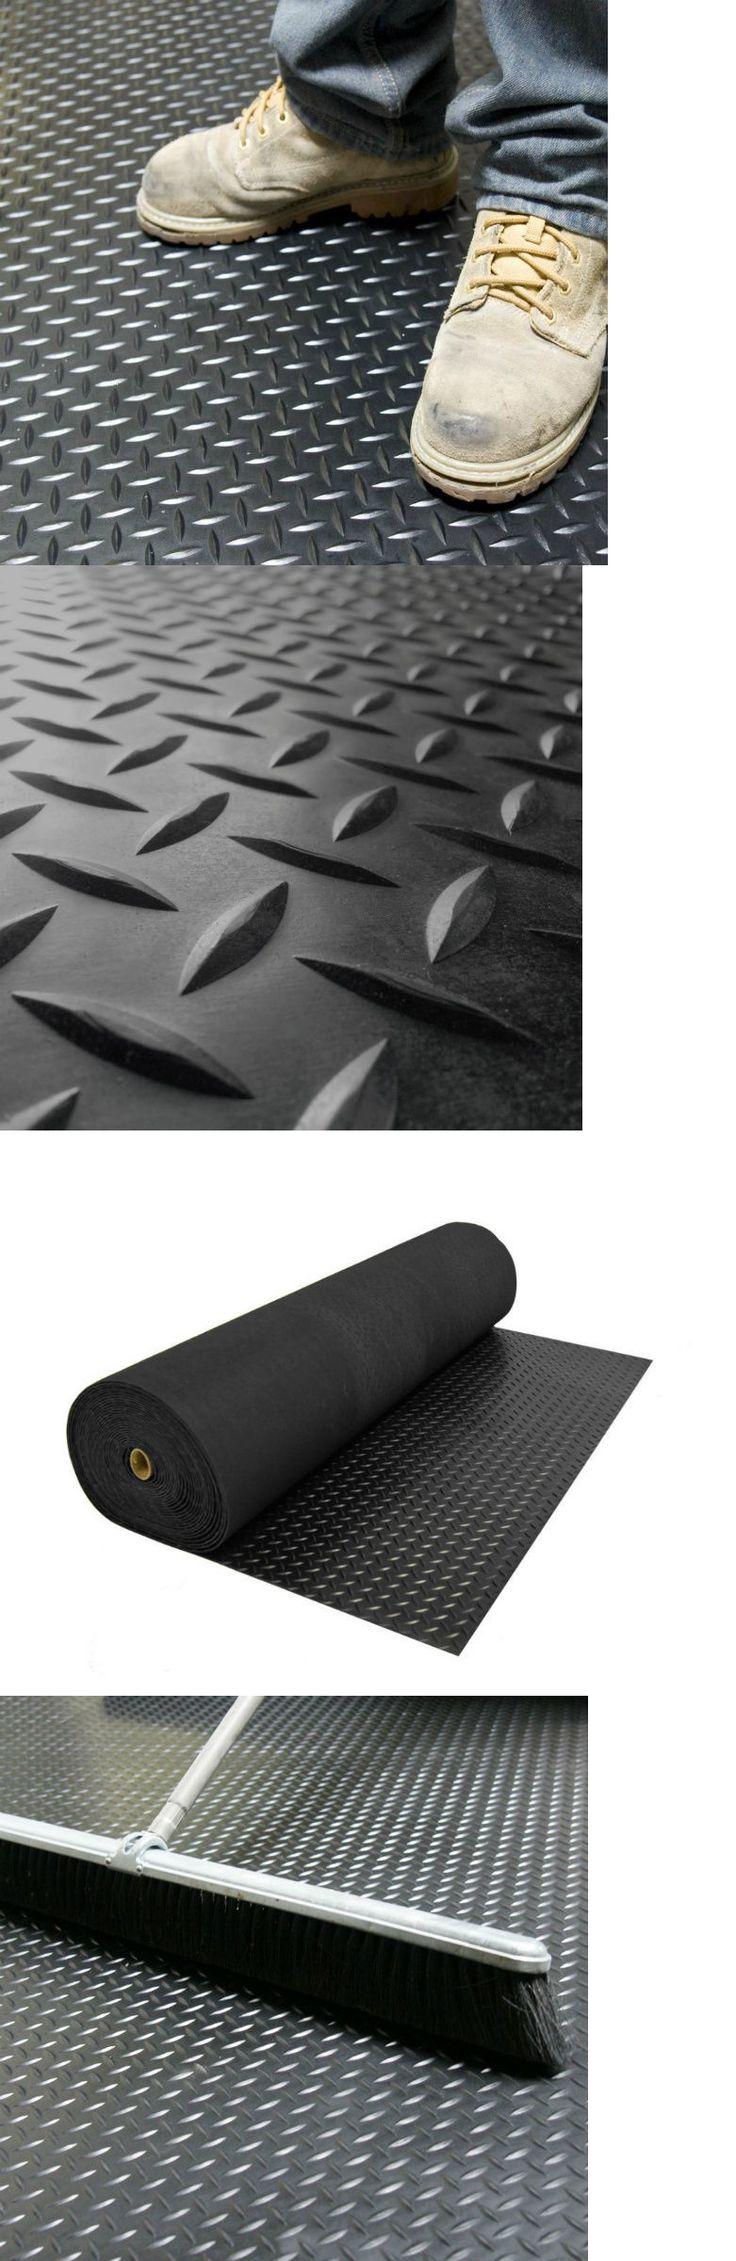 Rubber mats chennai - Equipment Mats And Flooring 179806 Garage Flooring Roll Out Gym Mats For Home Rubber Garage